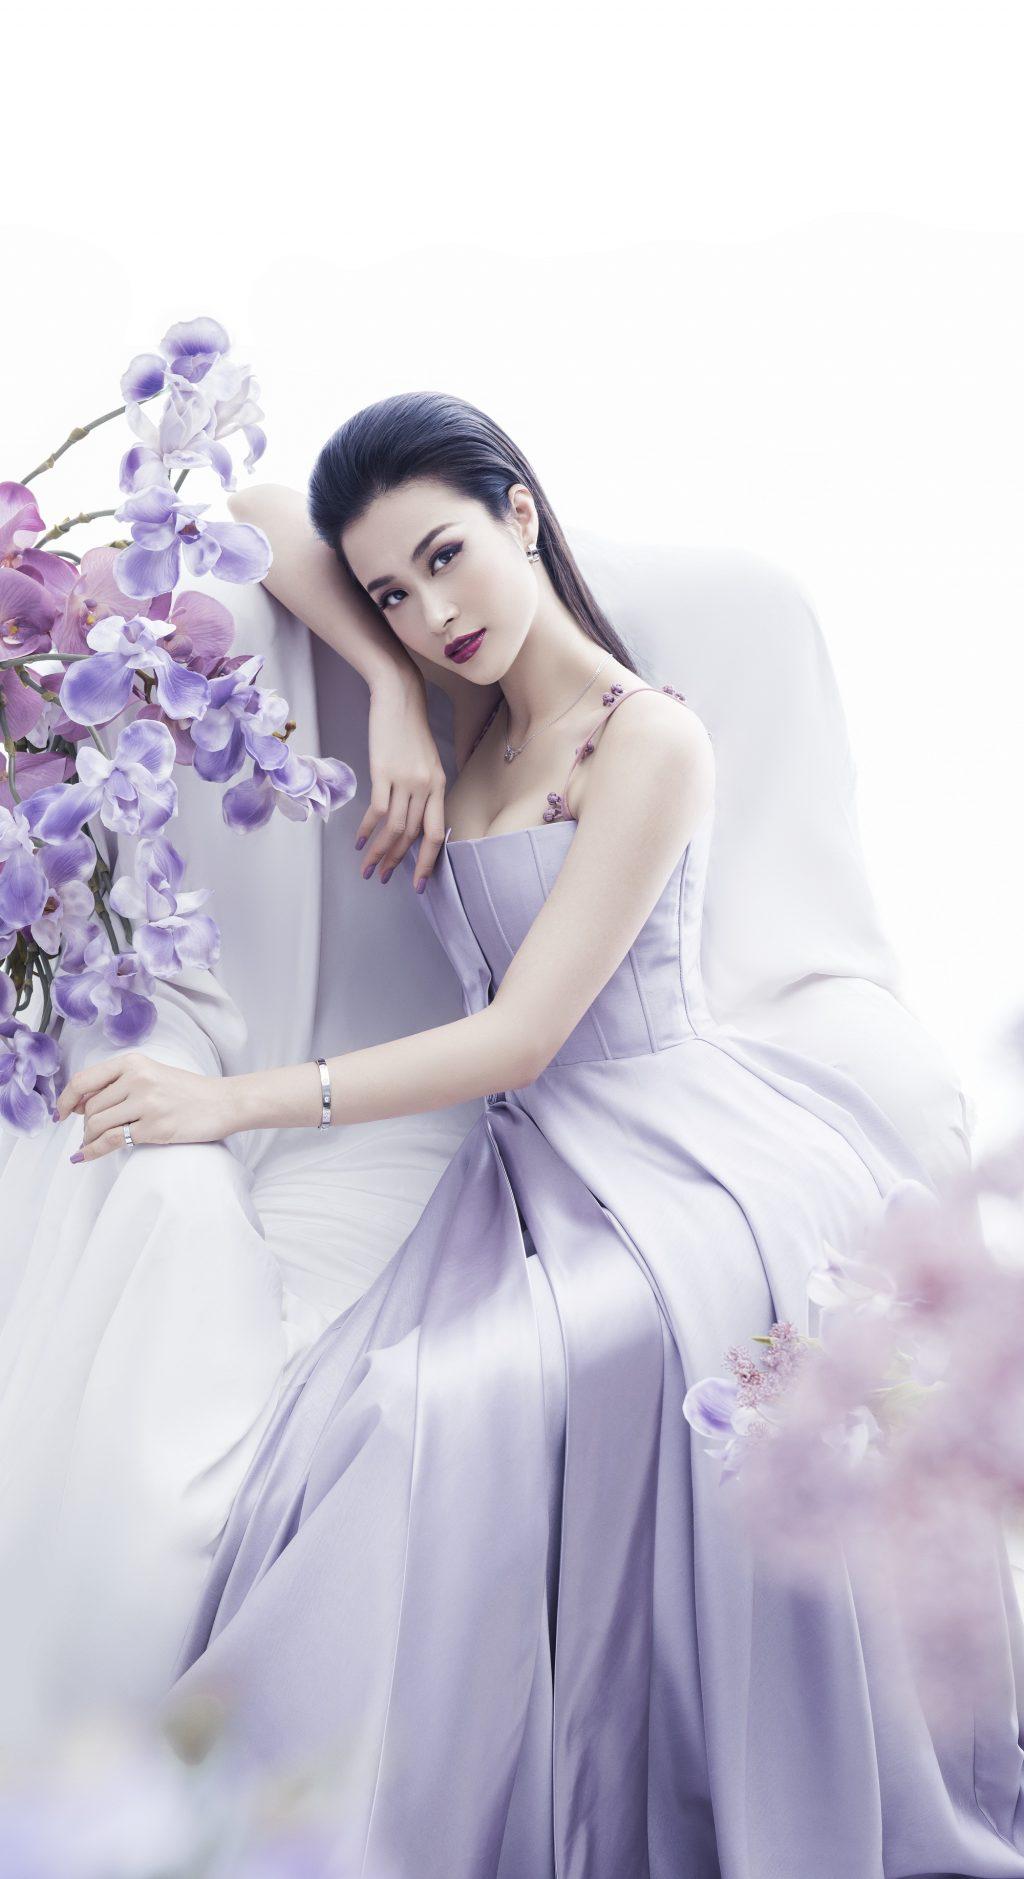 ELLE Beauty Awards 2019 dnn